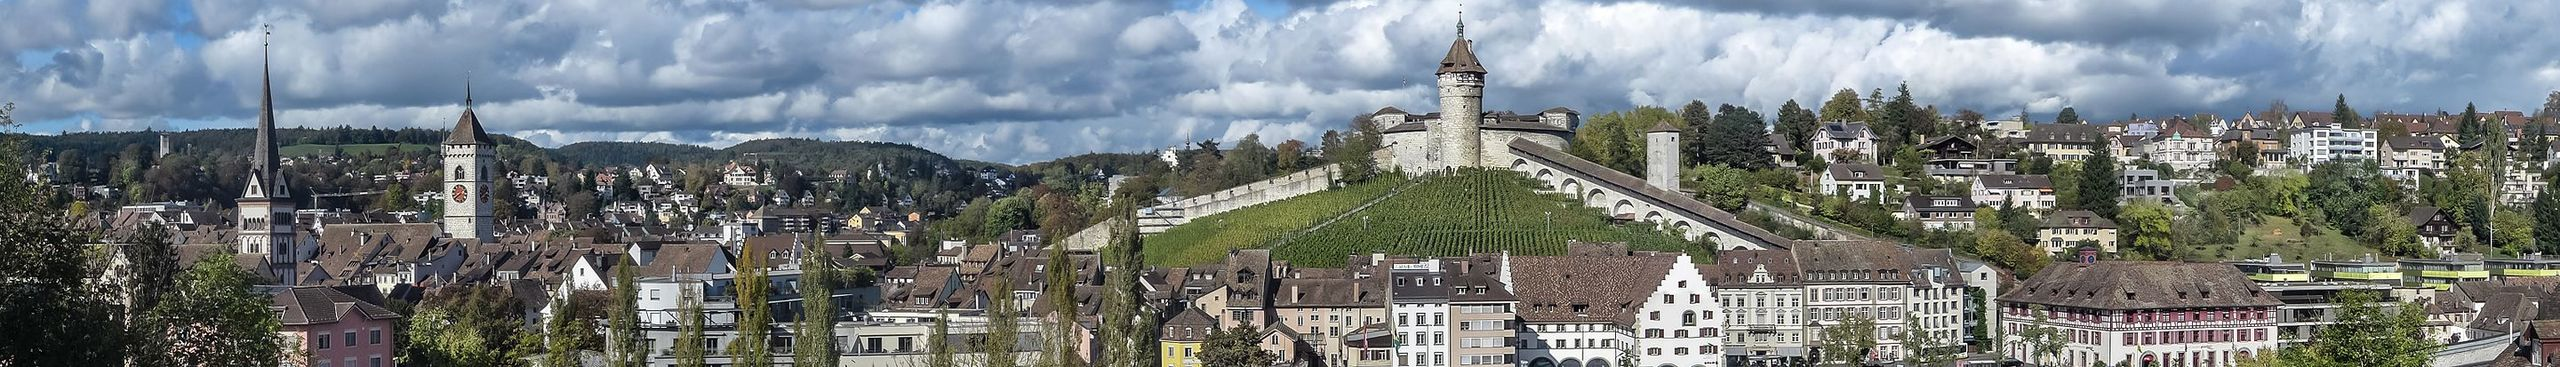 Schaffhausen Travel guide at Wikivoyage